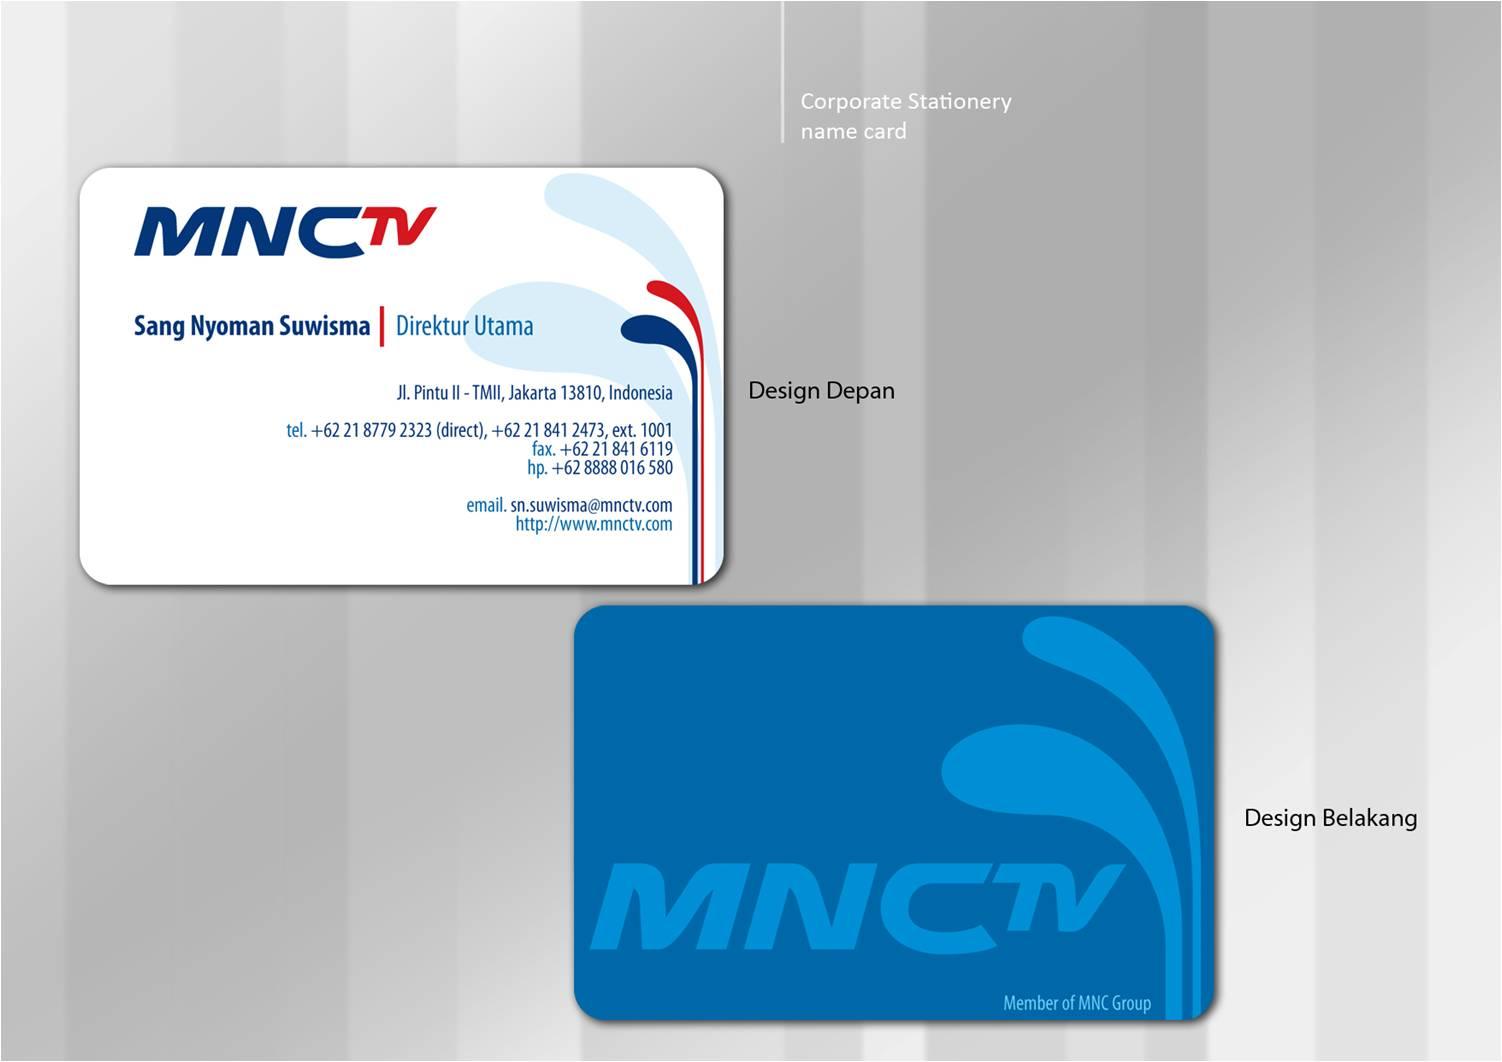 Julyana_kapitaselekta: Relaunch MNC TV